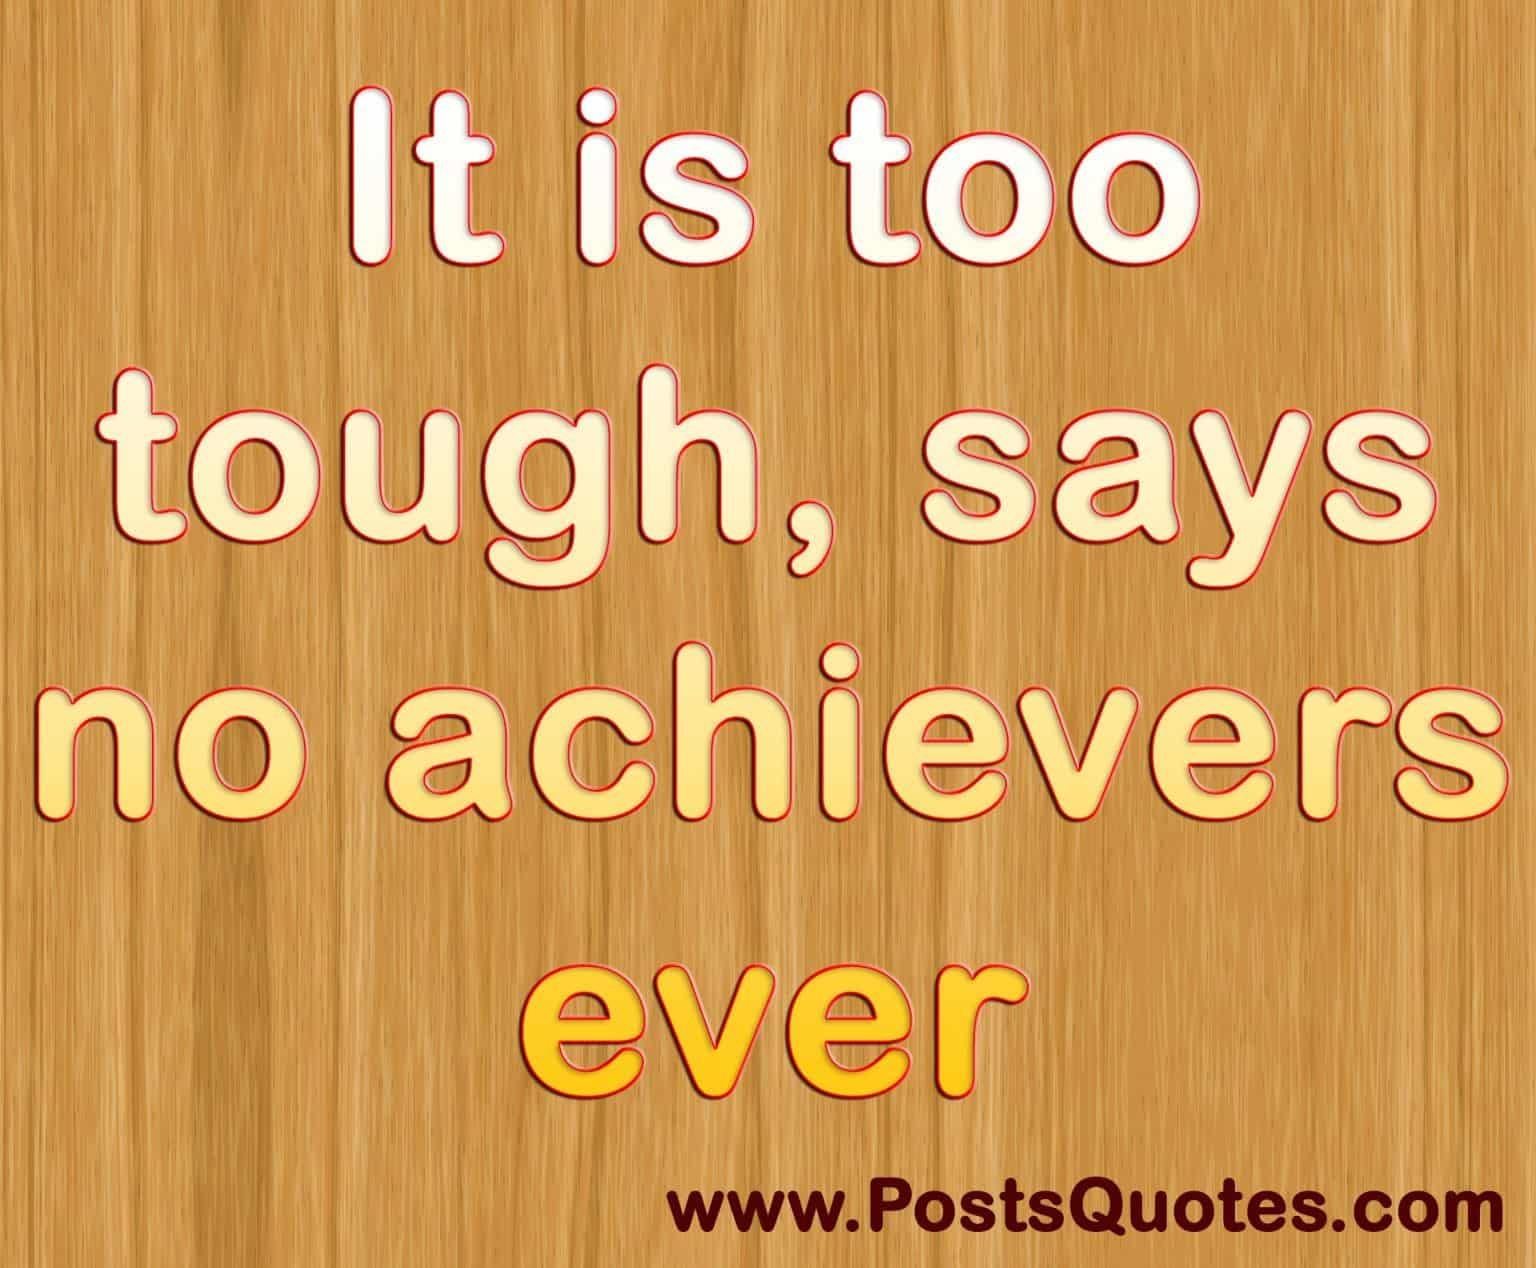 uplifting quotes 24